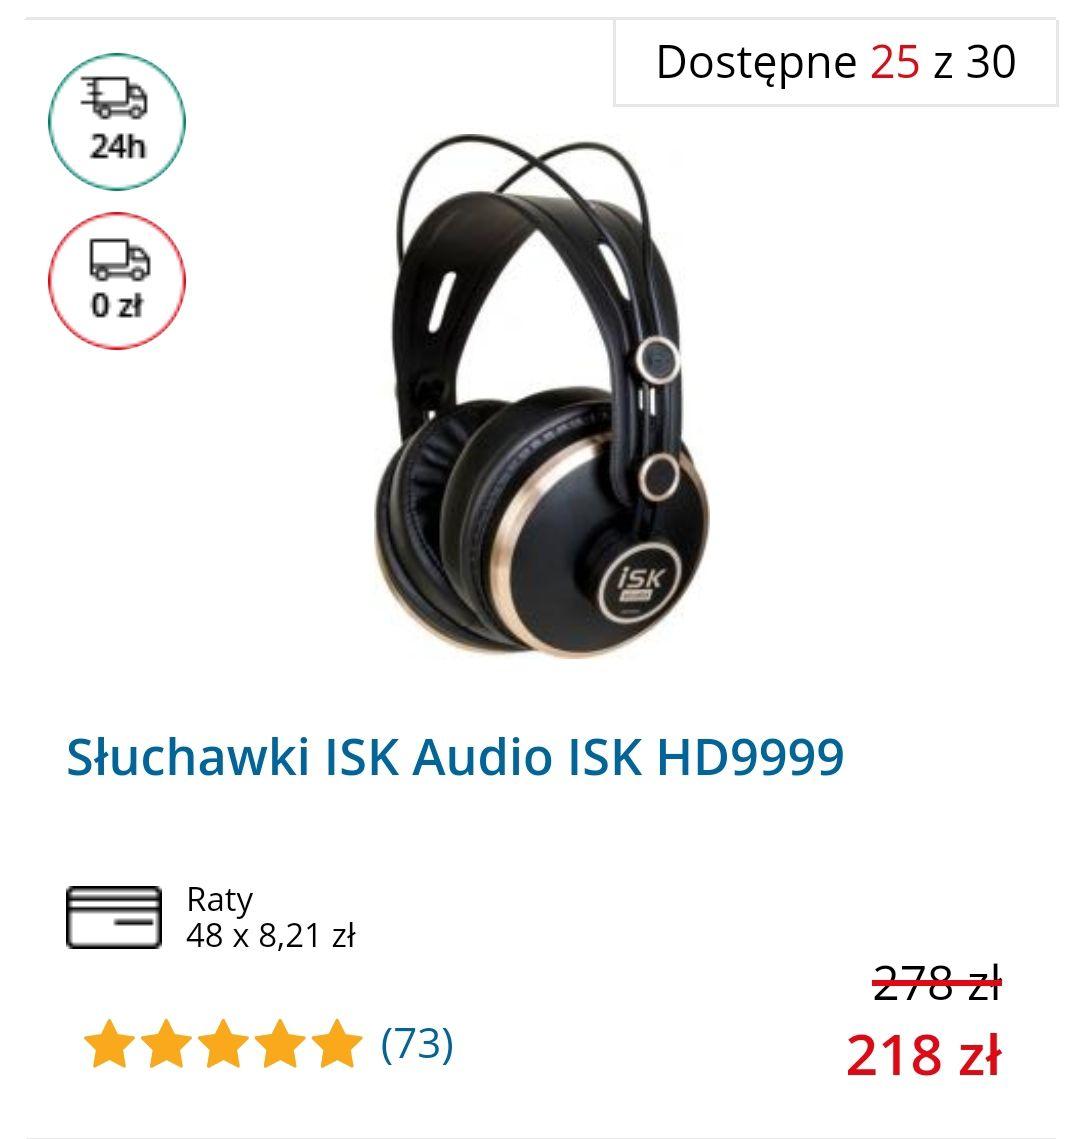 Słuchawki ISK HD 9999